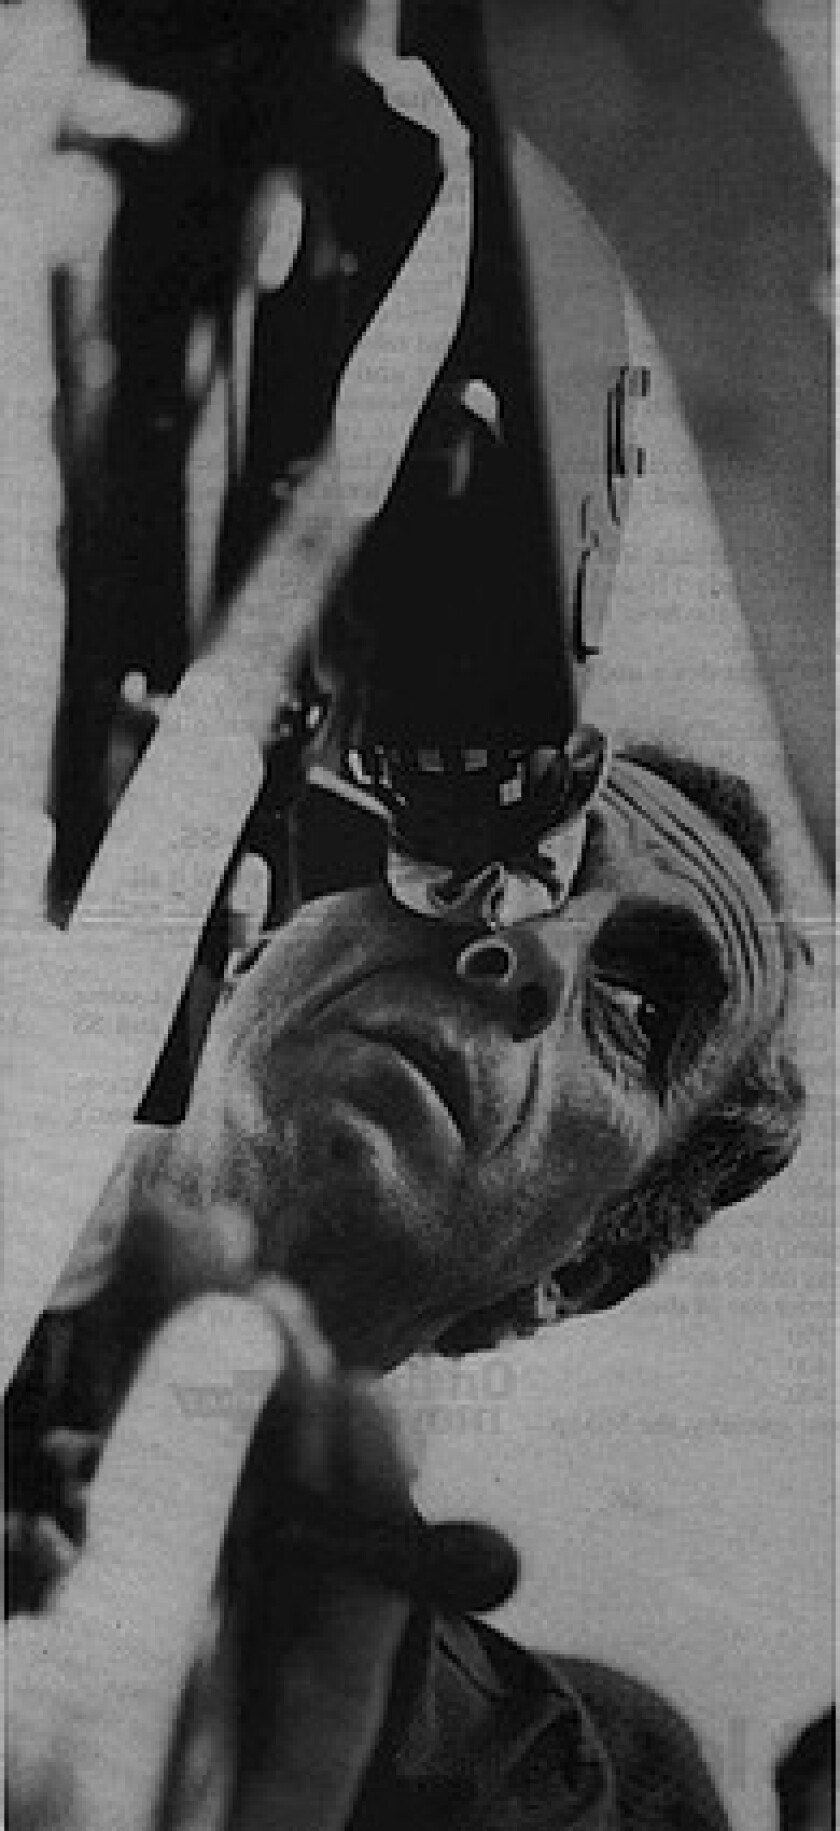 Antonioni's camerawork revealed hidden emotions.